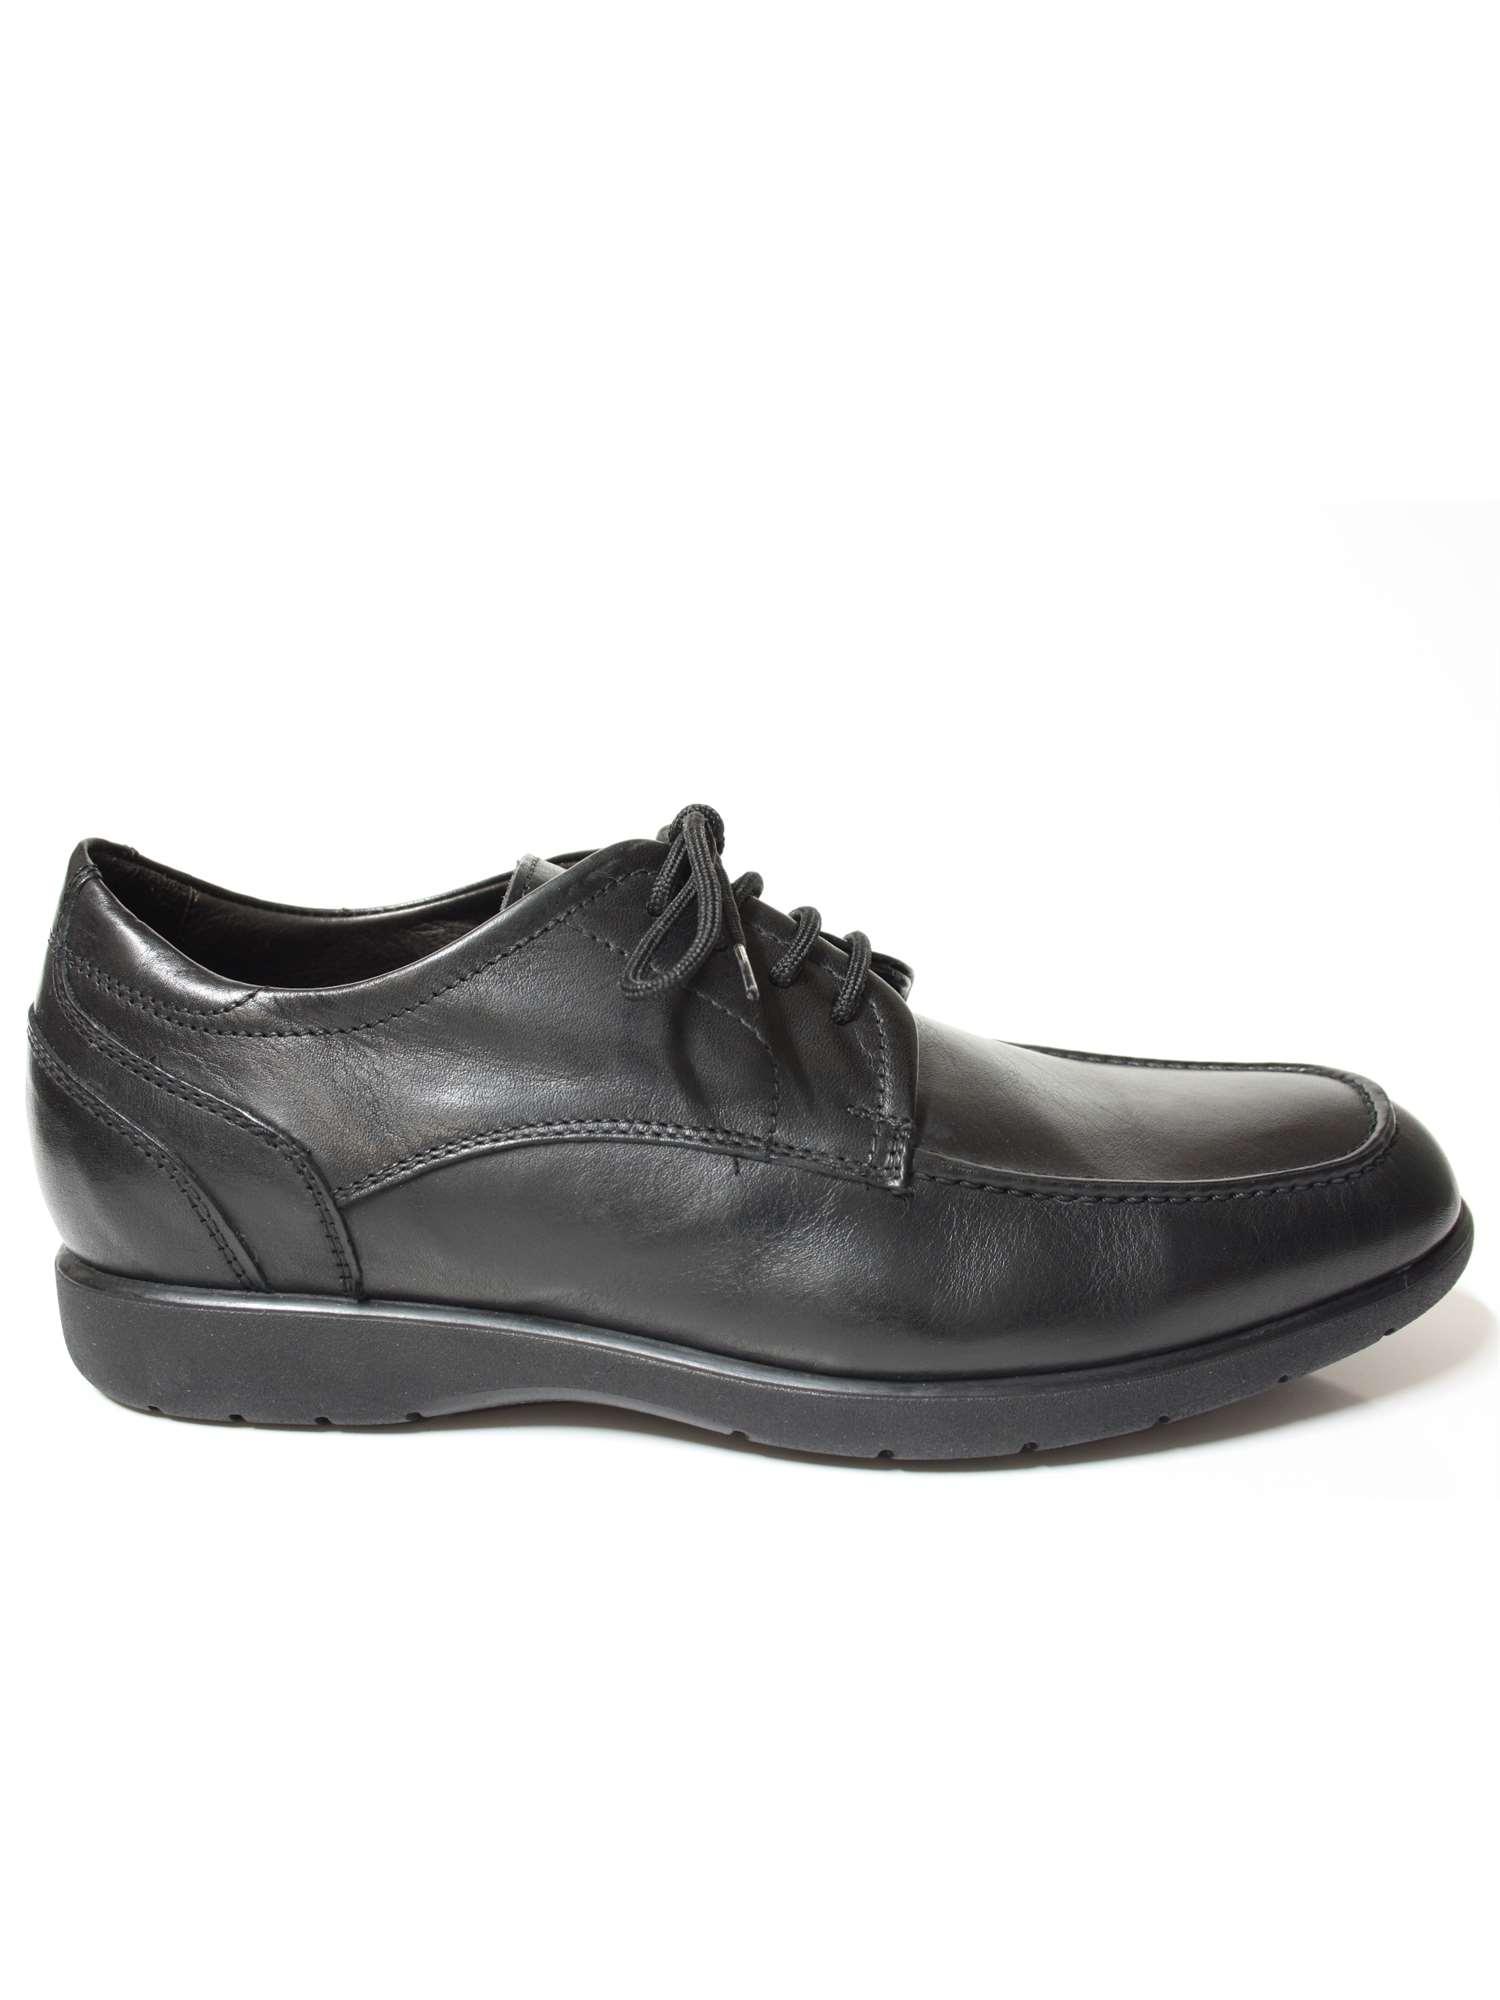 Lion Shoes 10600 Nero Scarpe Uomo 31d4ed9fbec